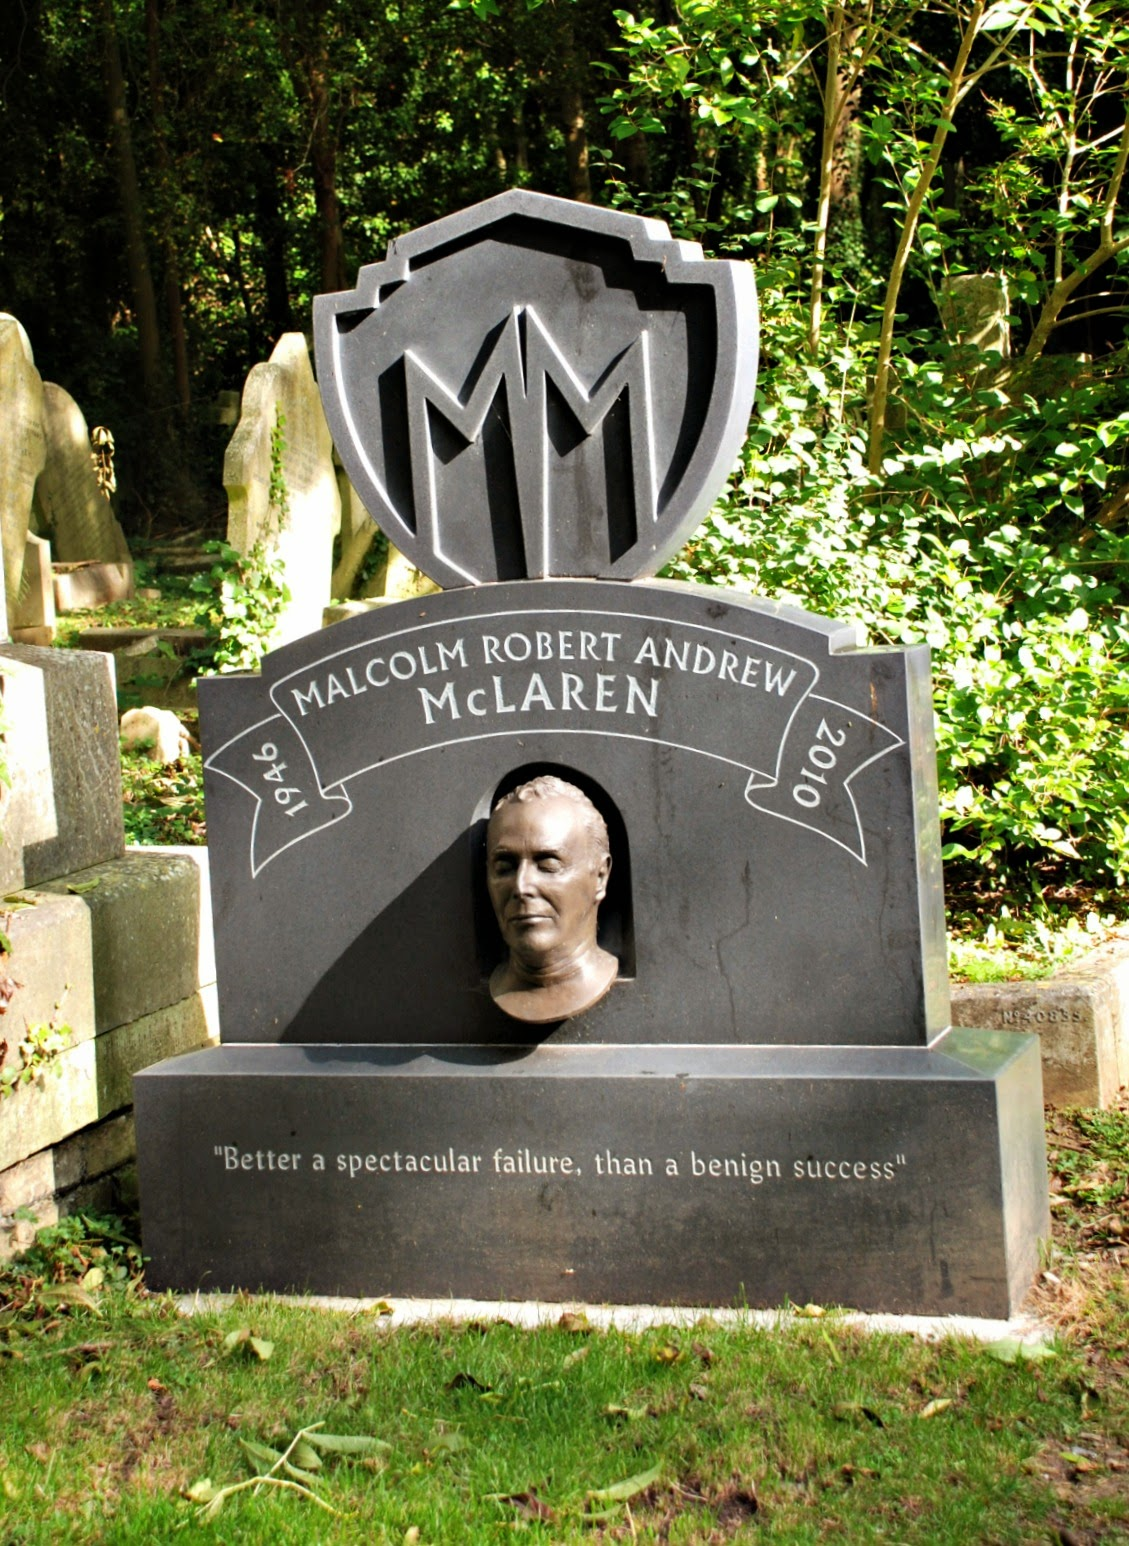 Malcolm McLaren's memorial, Highgate Cemetery, London